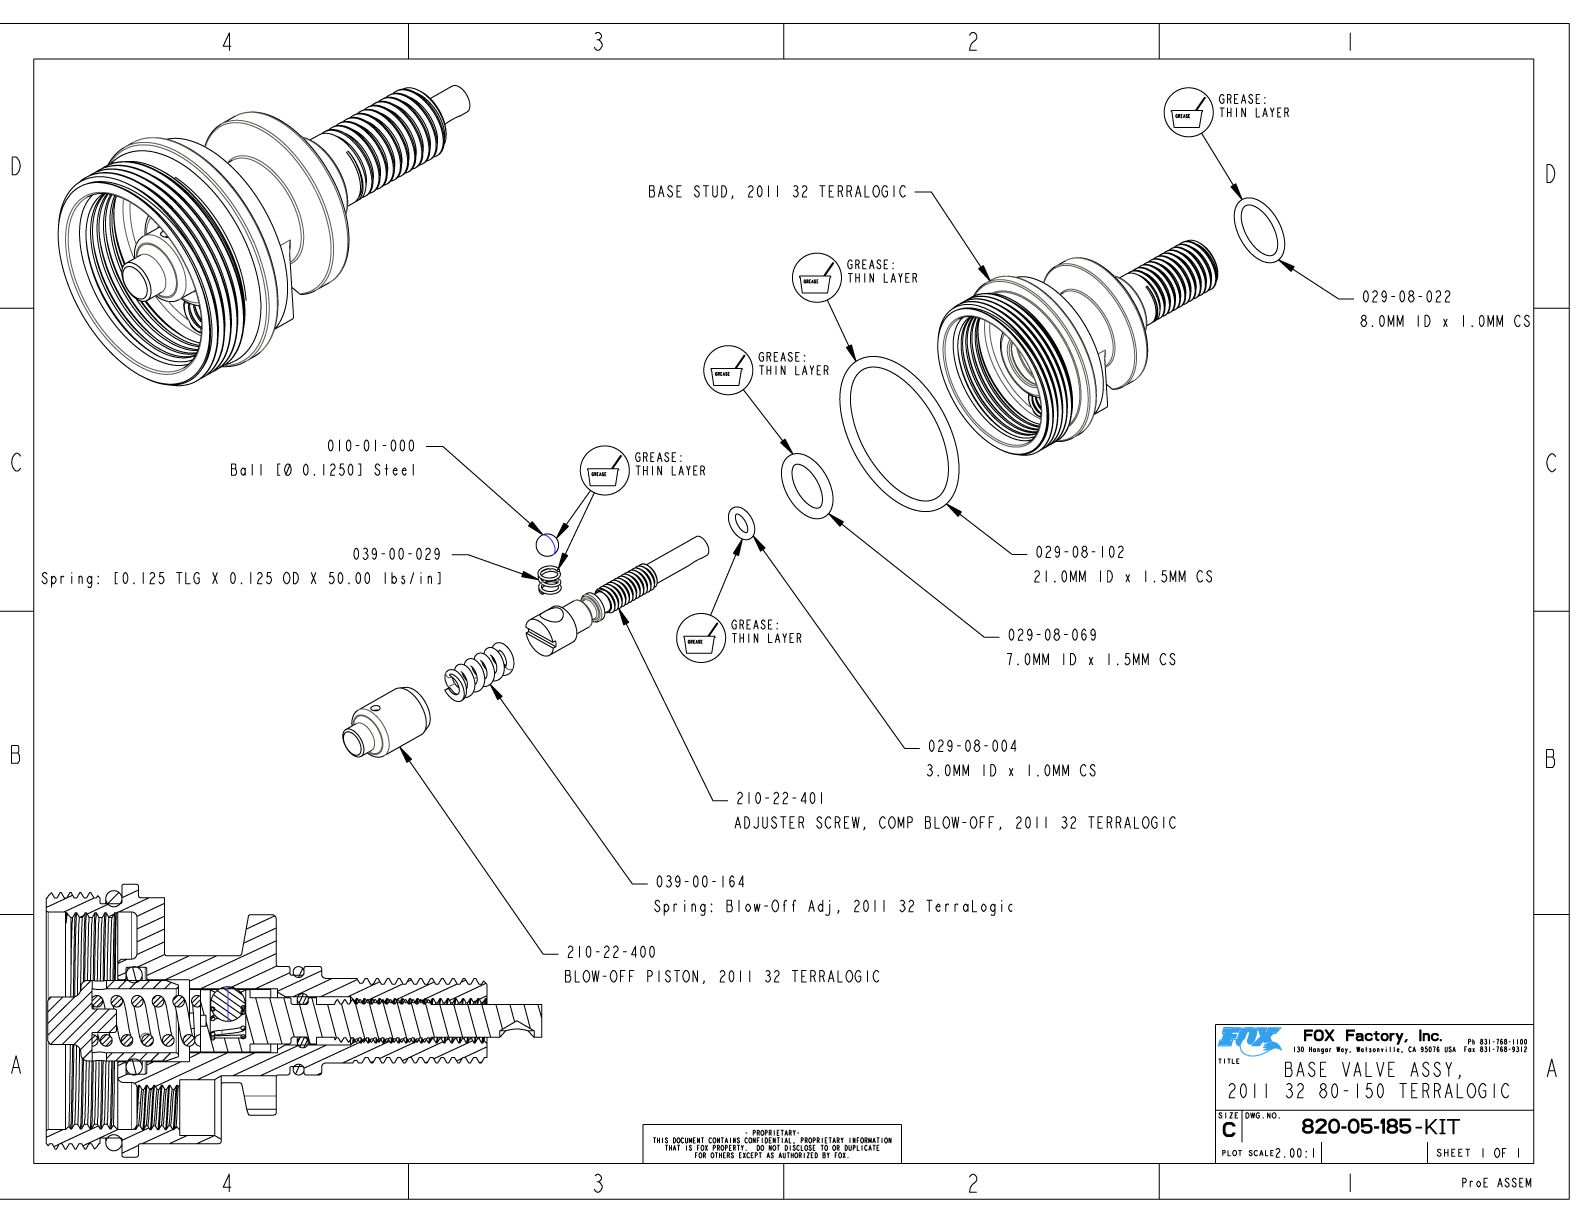 32mm Part Information